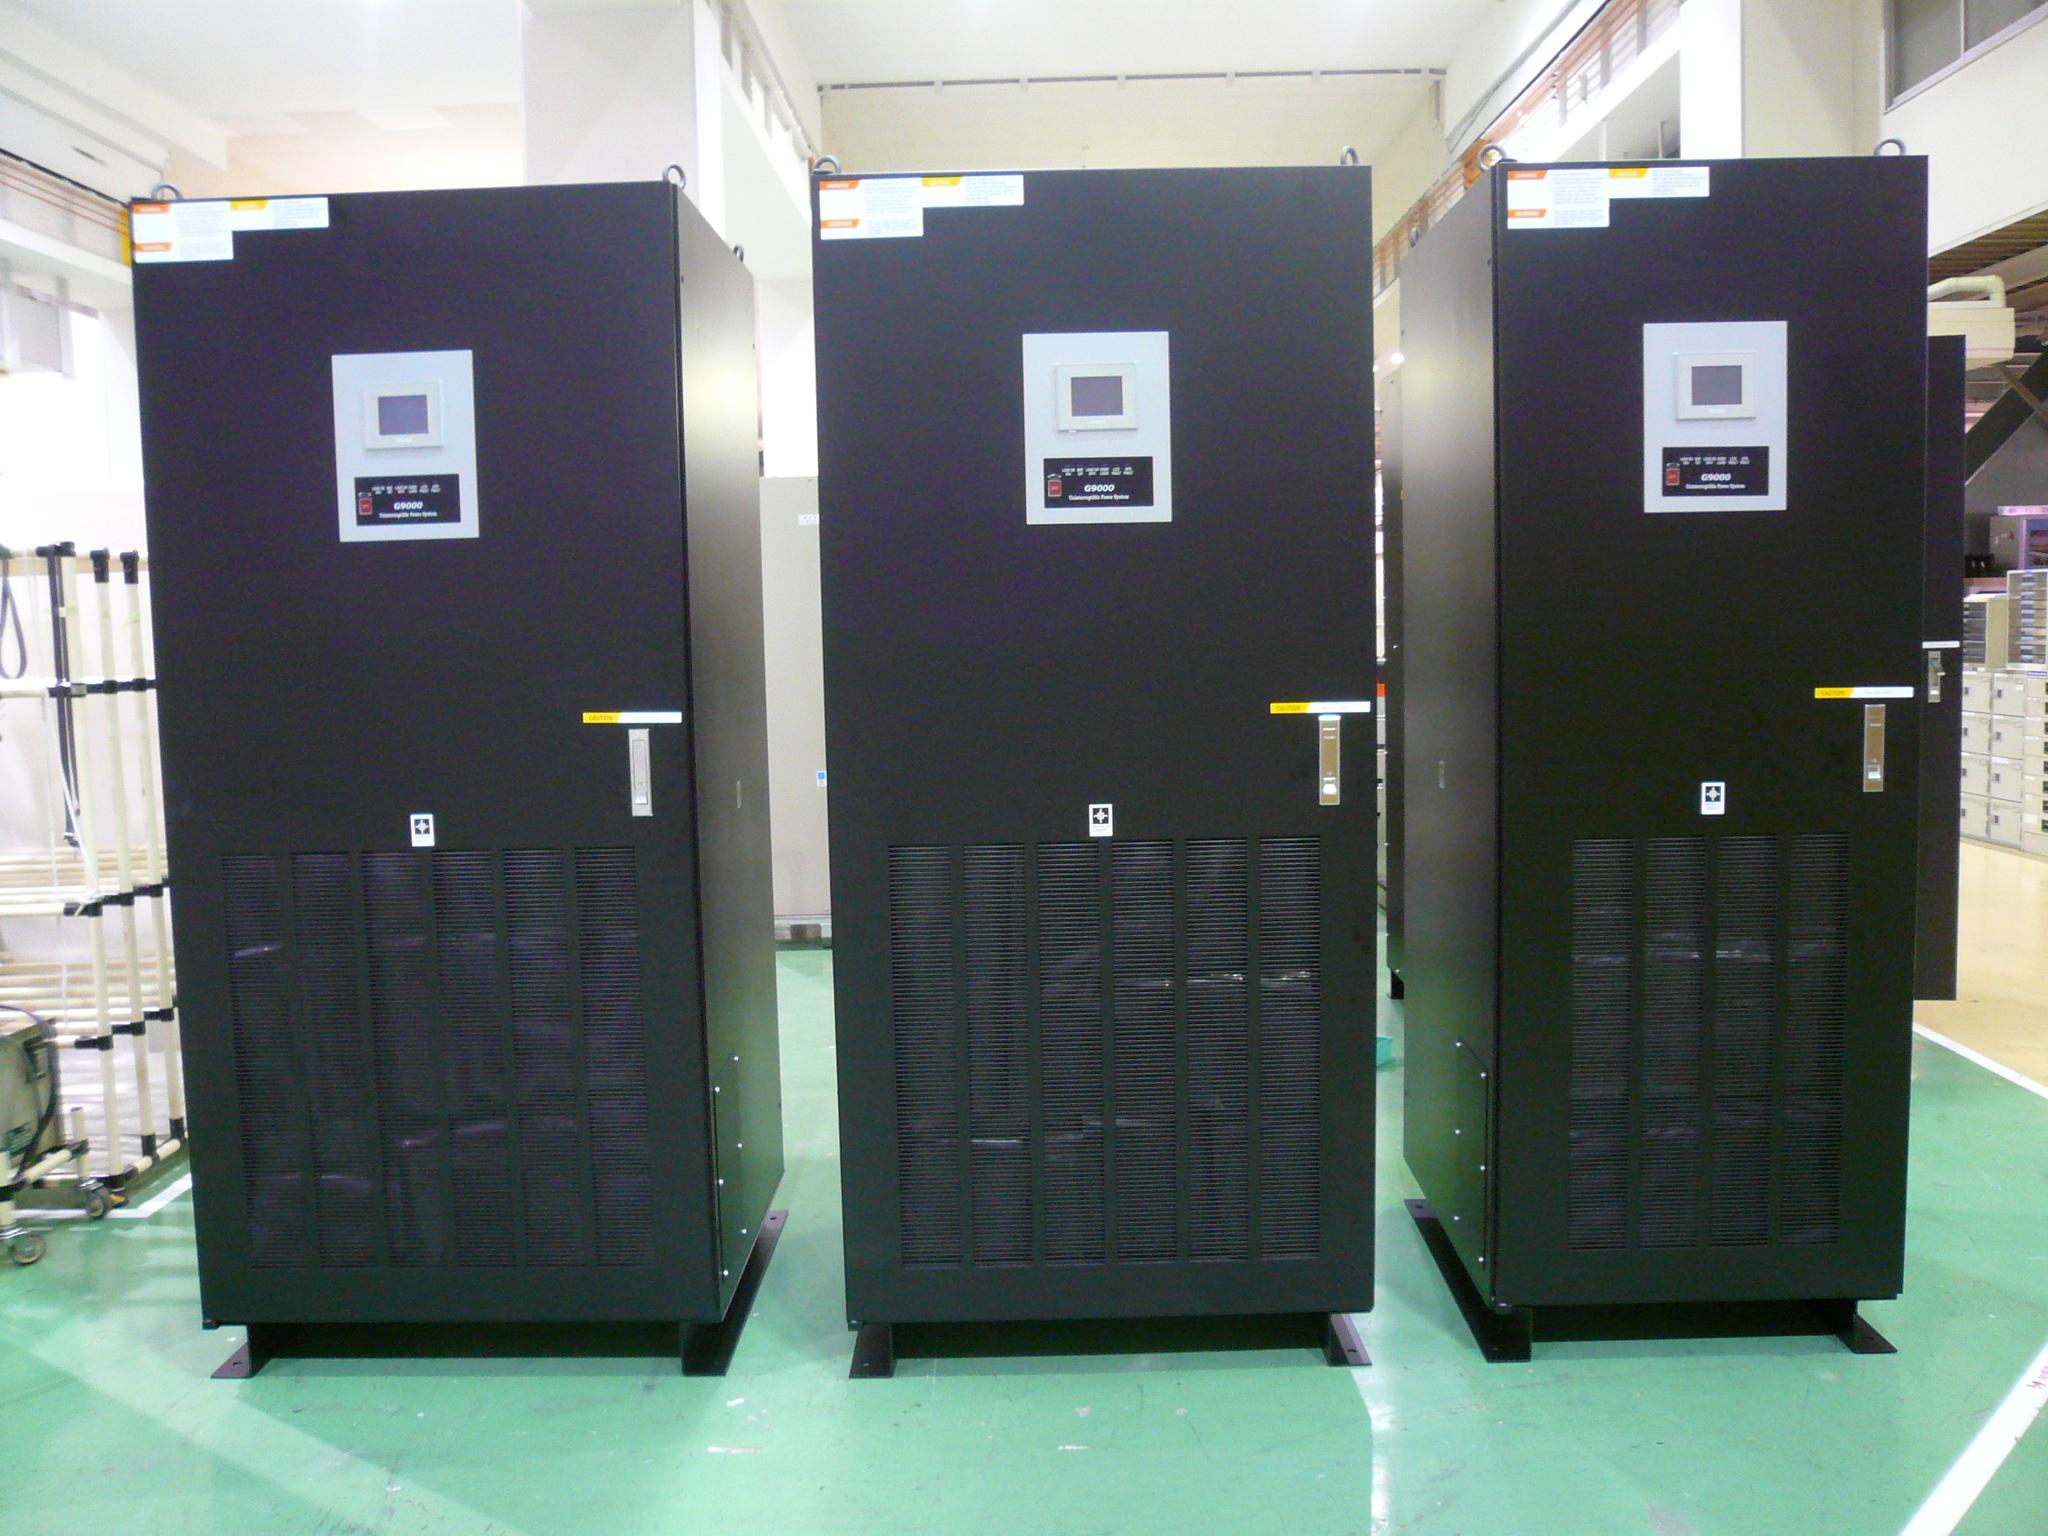 Toshiba 3 Phase Uninterruptible Power Supplies